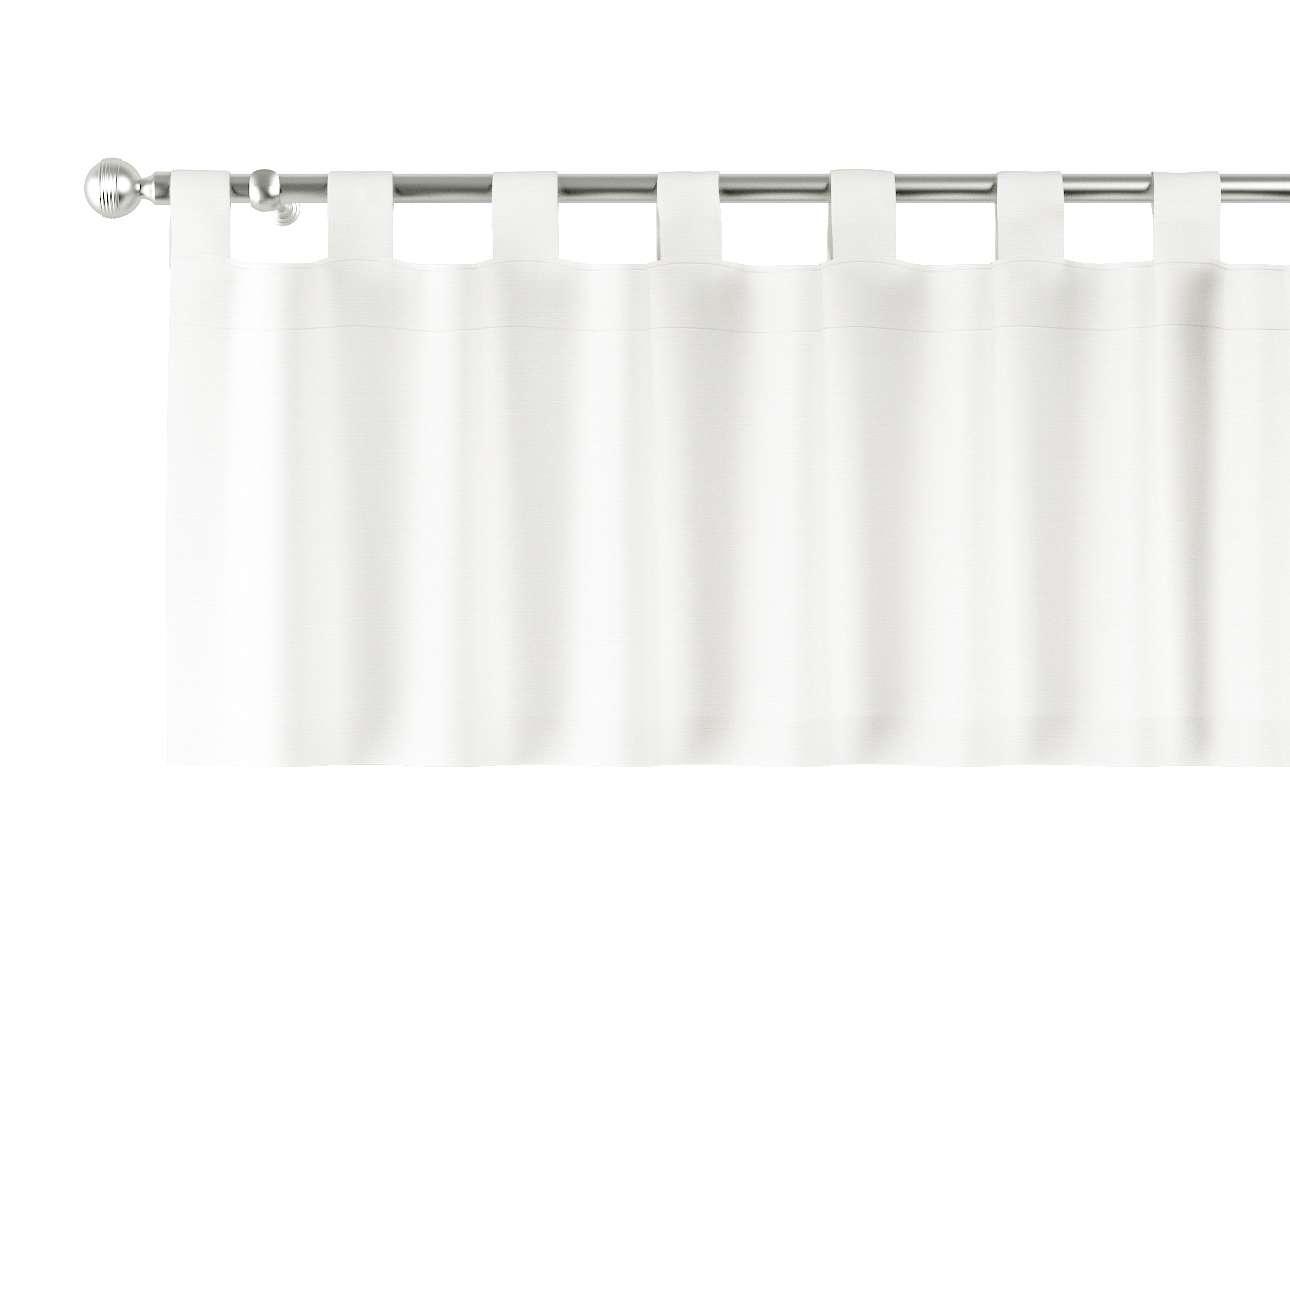 Lambrekin na szelkach w kolekcji Cotton Story, tkanina: 702-34